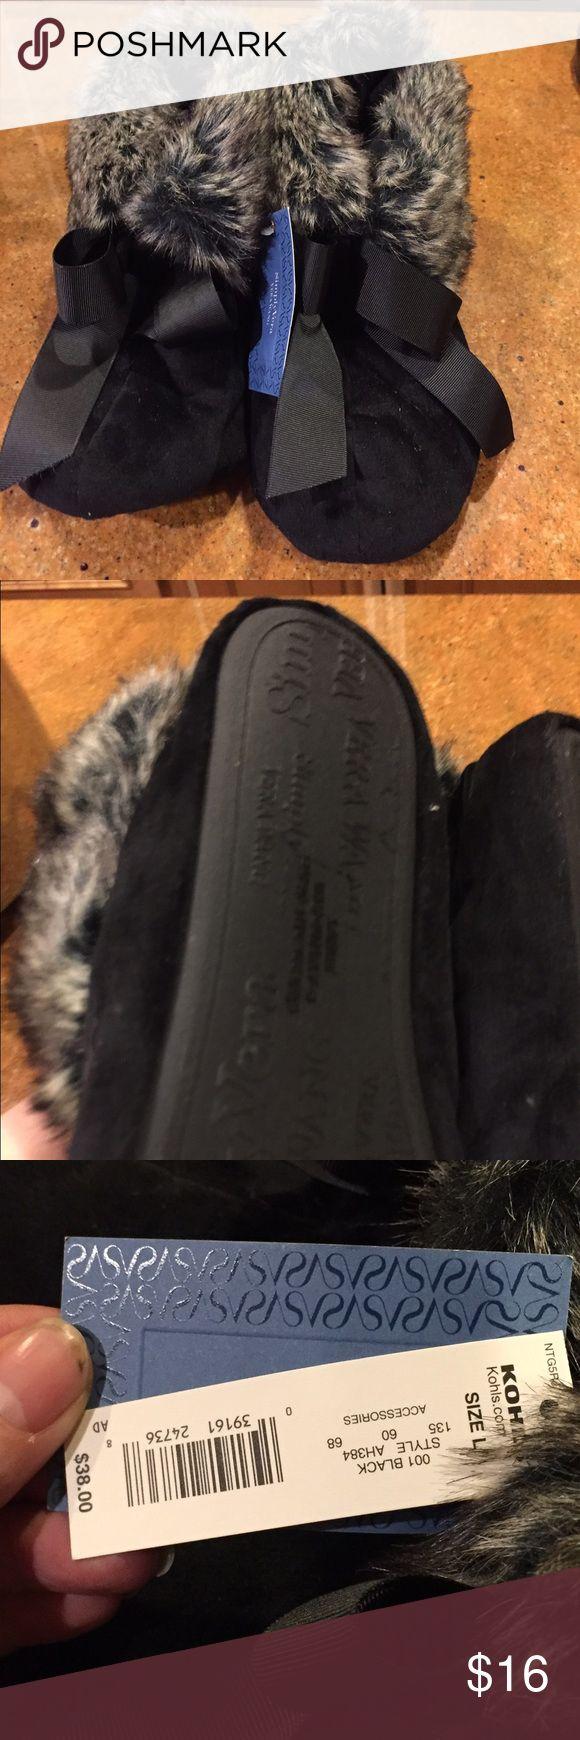 Simply Vera Very Wang Black slippers Simply Vera Very Wang Black slippers brand new size L Simply Vera Vera Wang Shoes Slippers